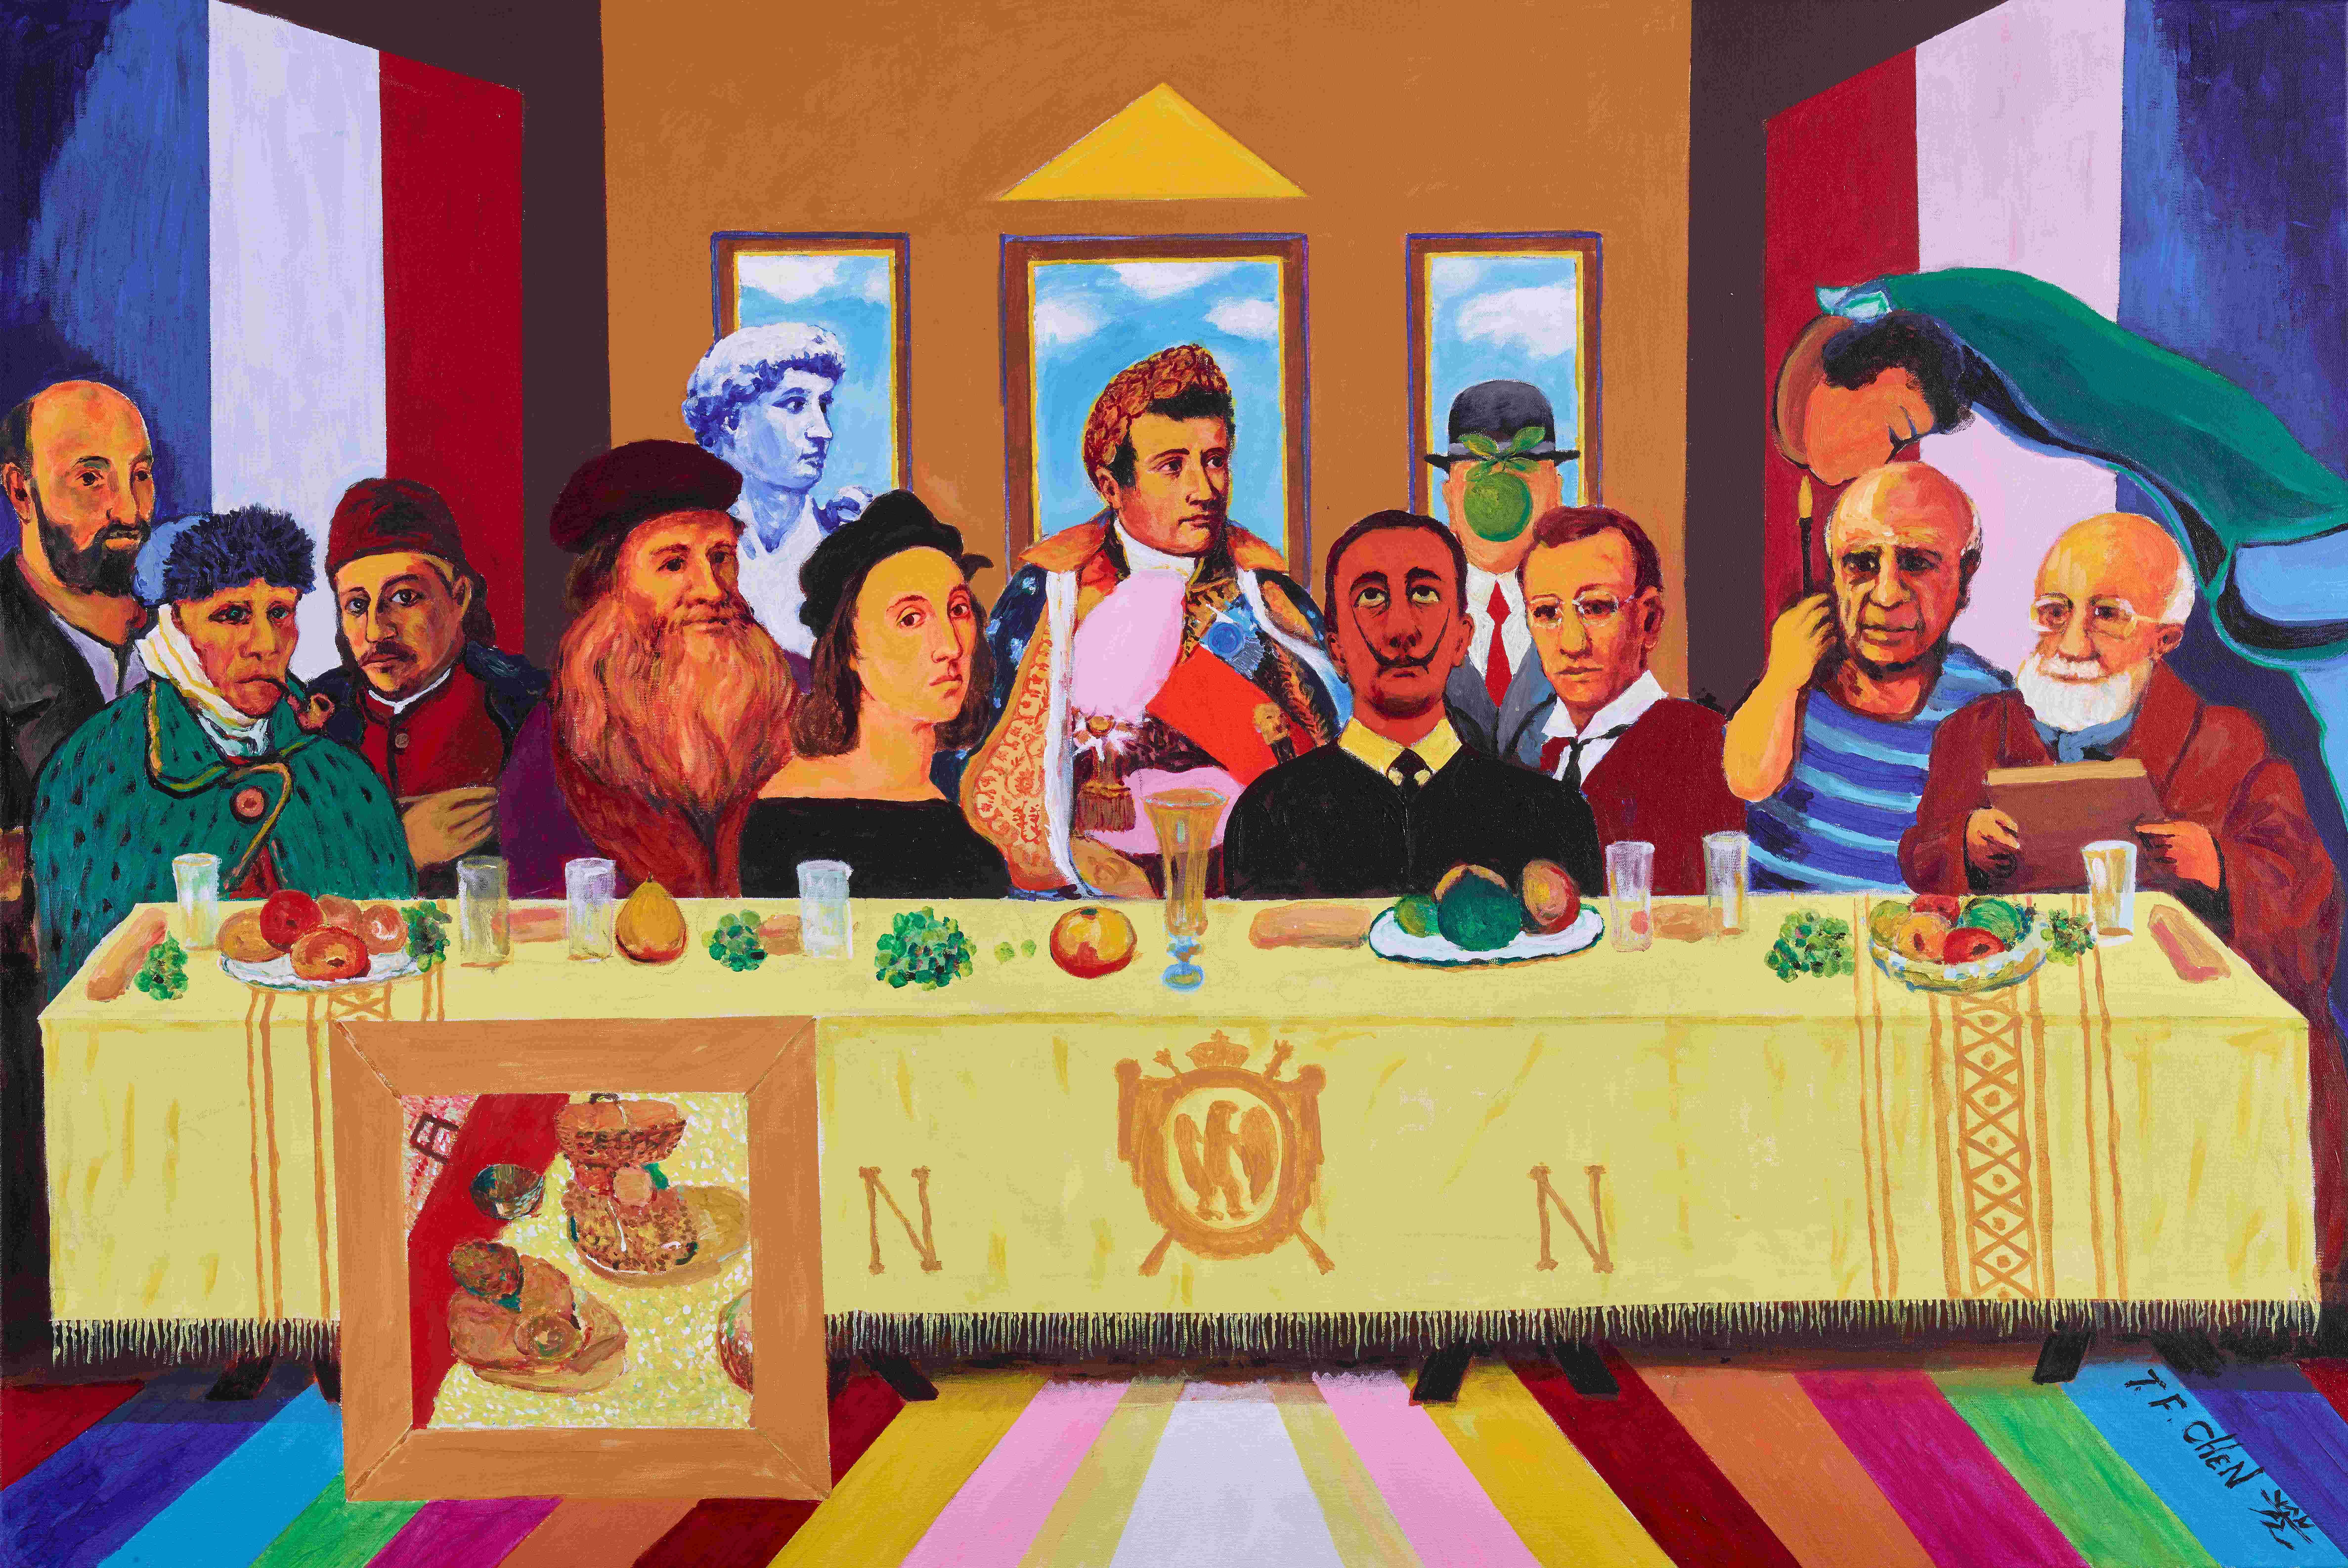 A18. Lasting Supper for Modernity Toward Millennity-從現代性迎向千禧性(以愛為宗的全球新文藝復興)